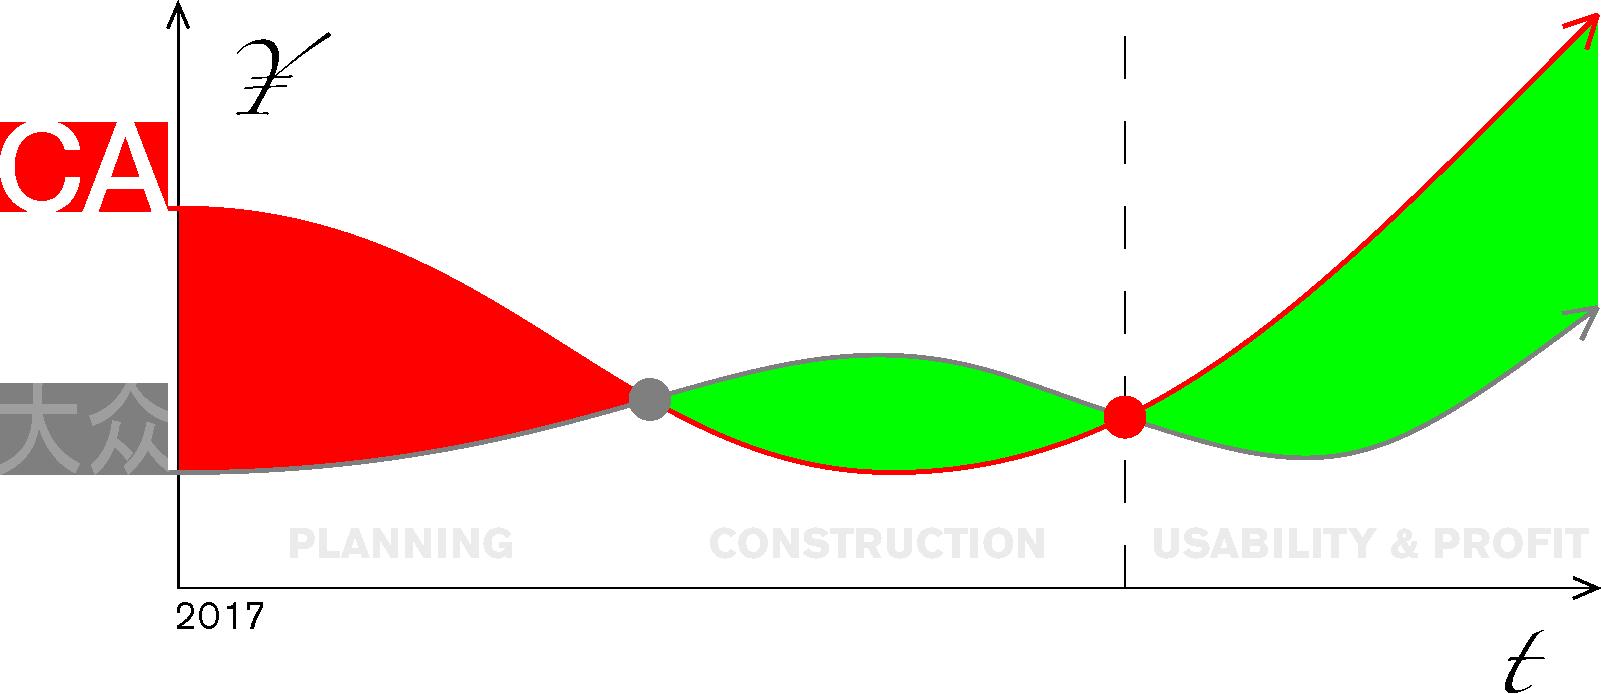 Image: 1. Planning, 2. Construction, 3. Usability & Profit